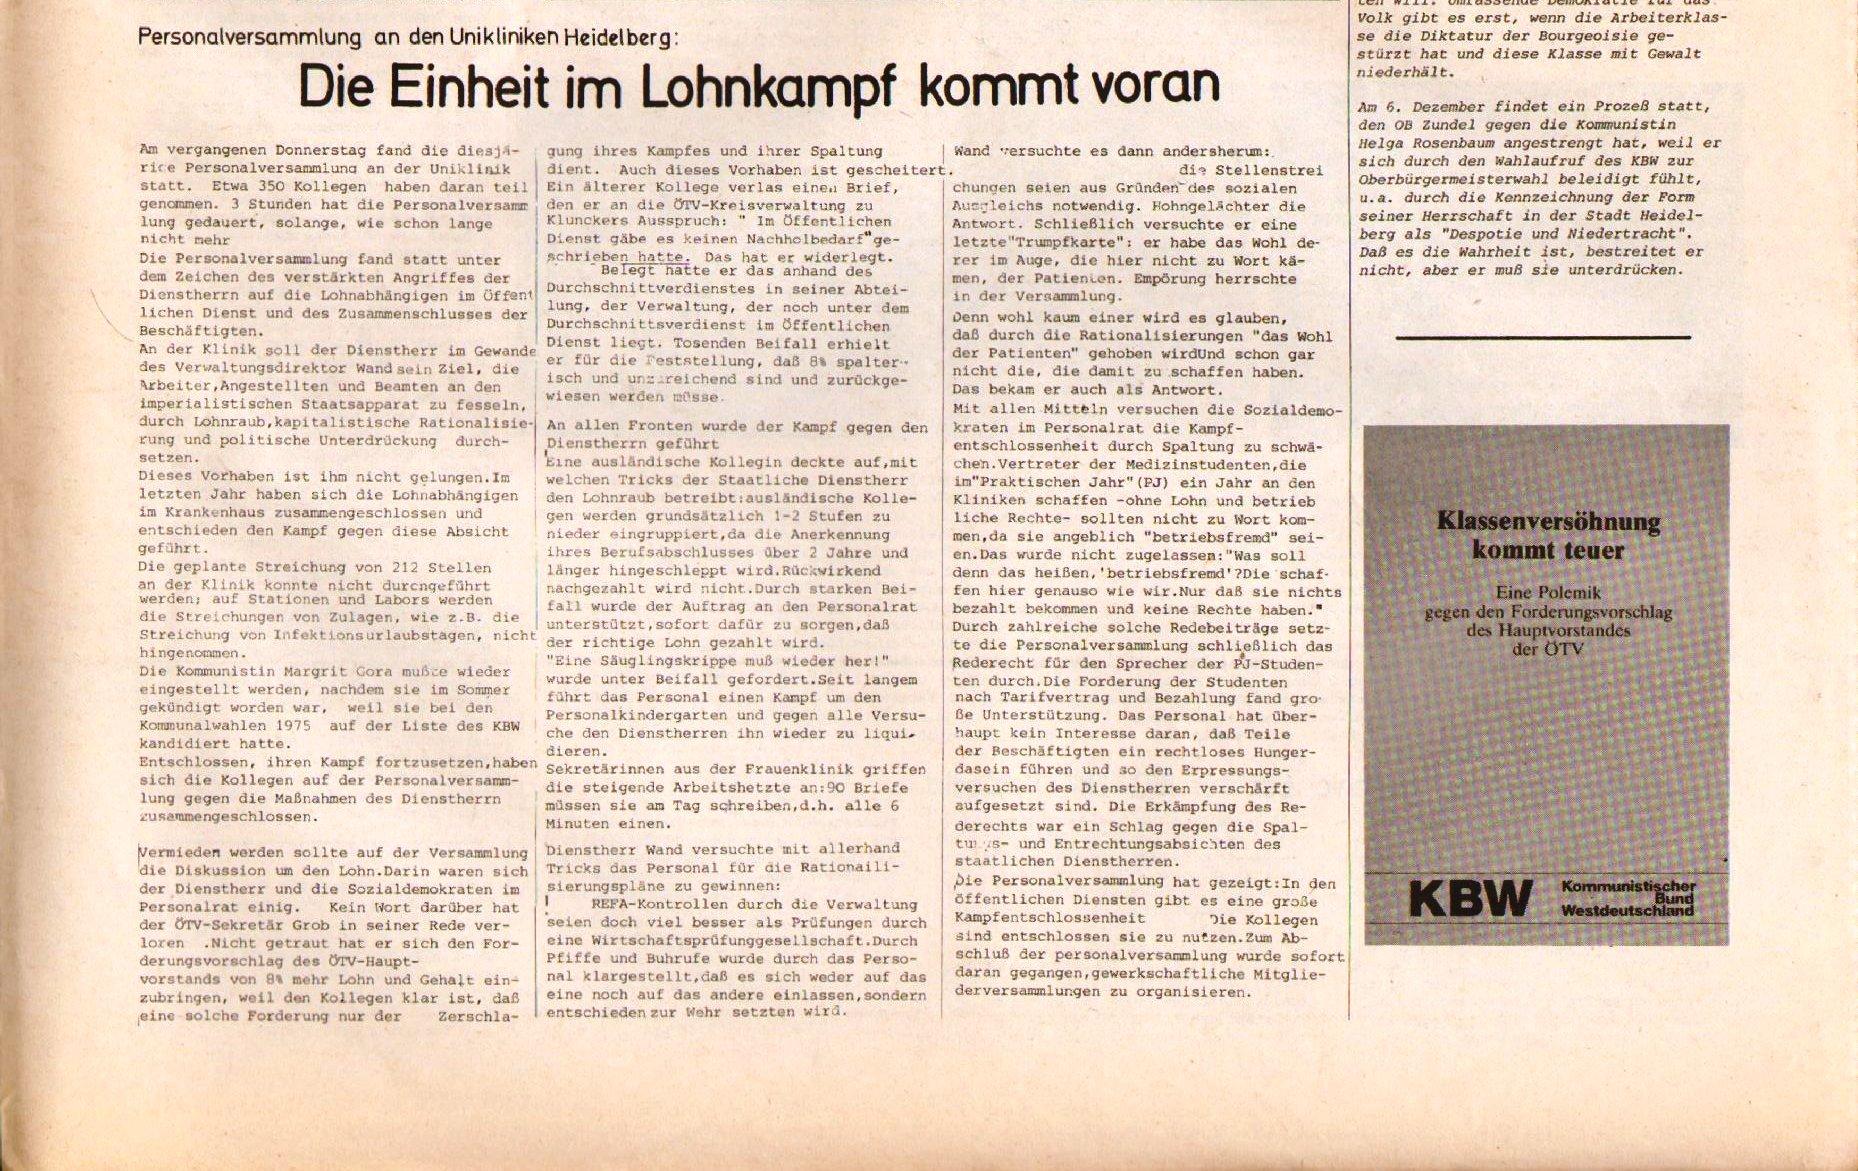 Rhein_Neckar_KBW184